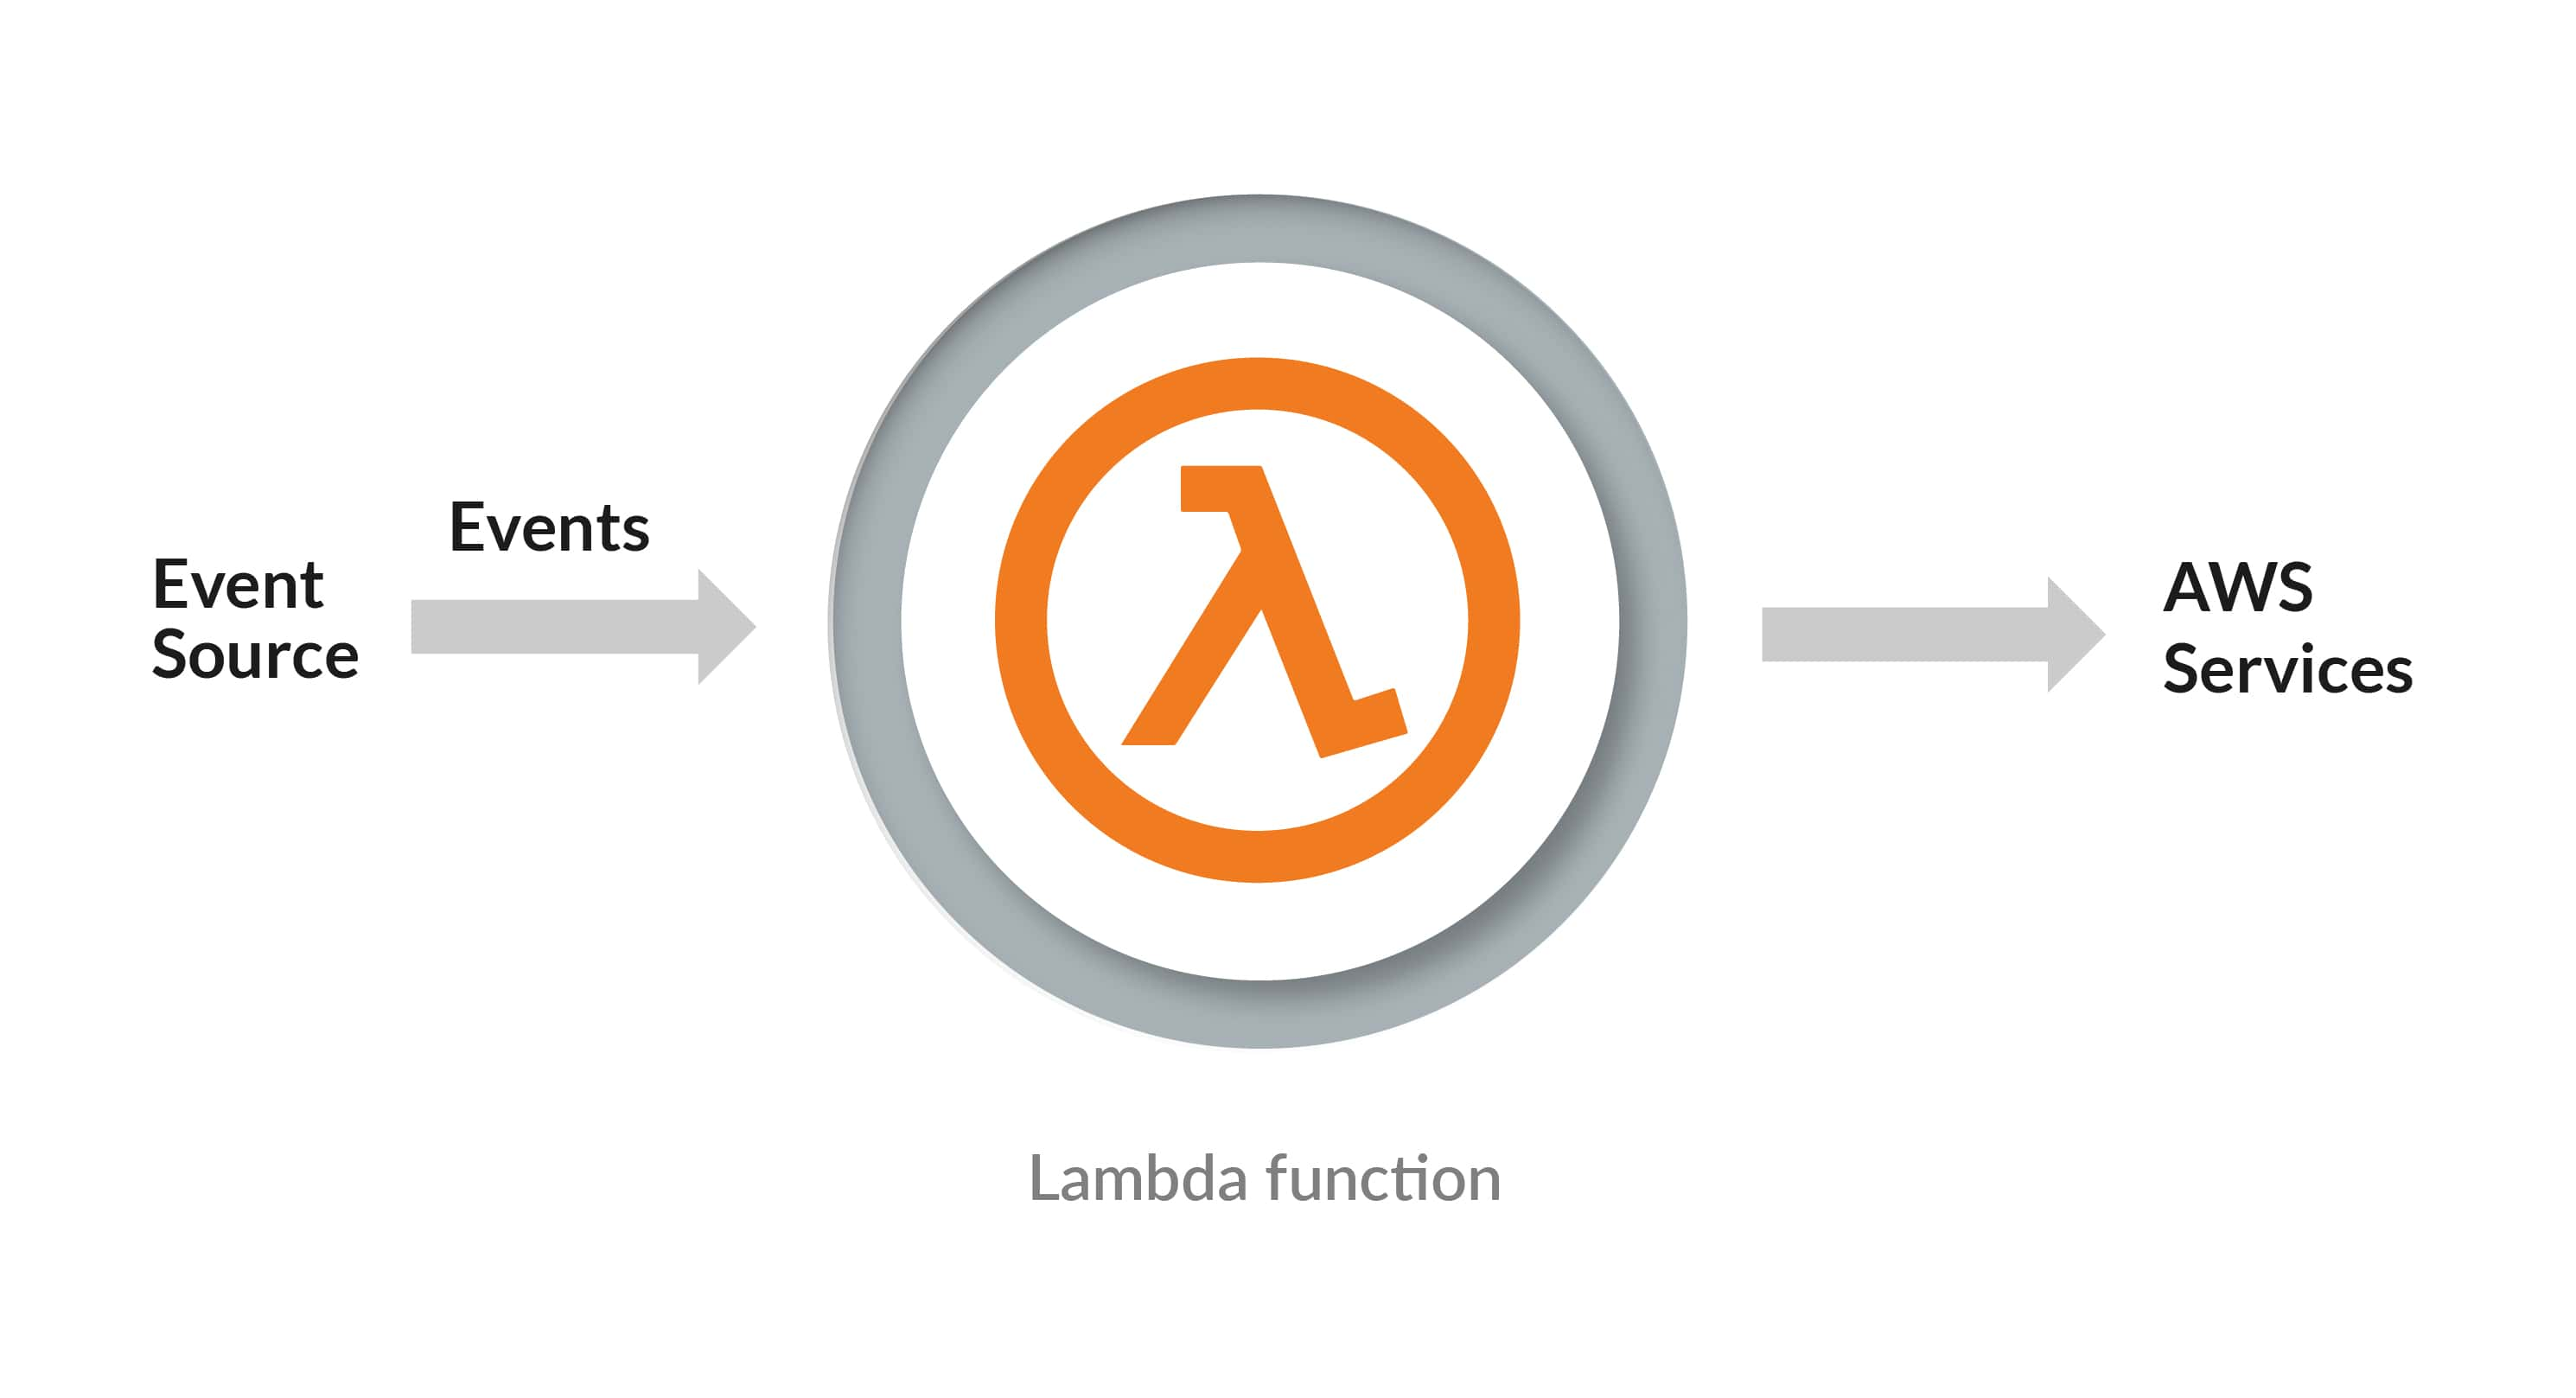 Running a Lambda function process